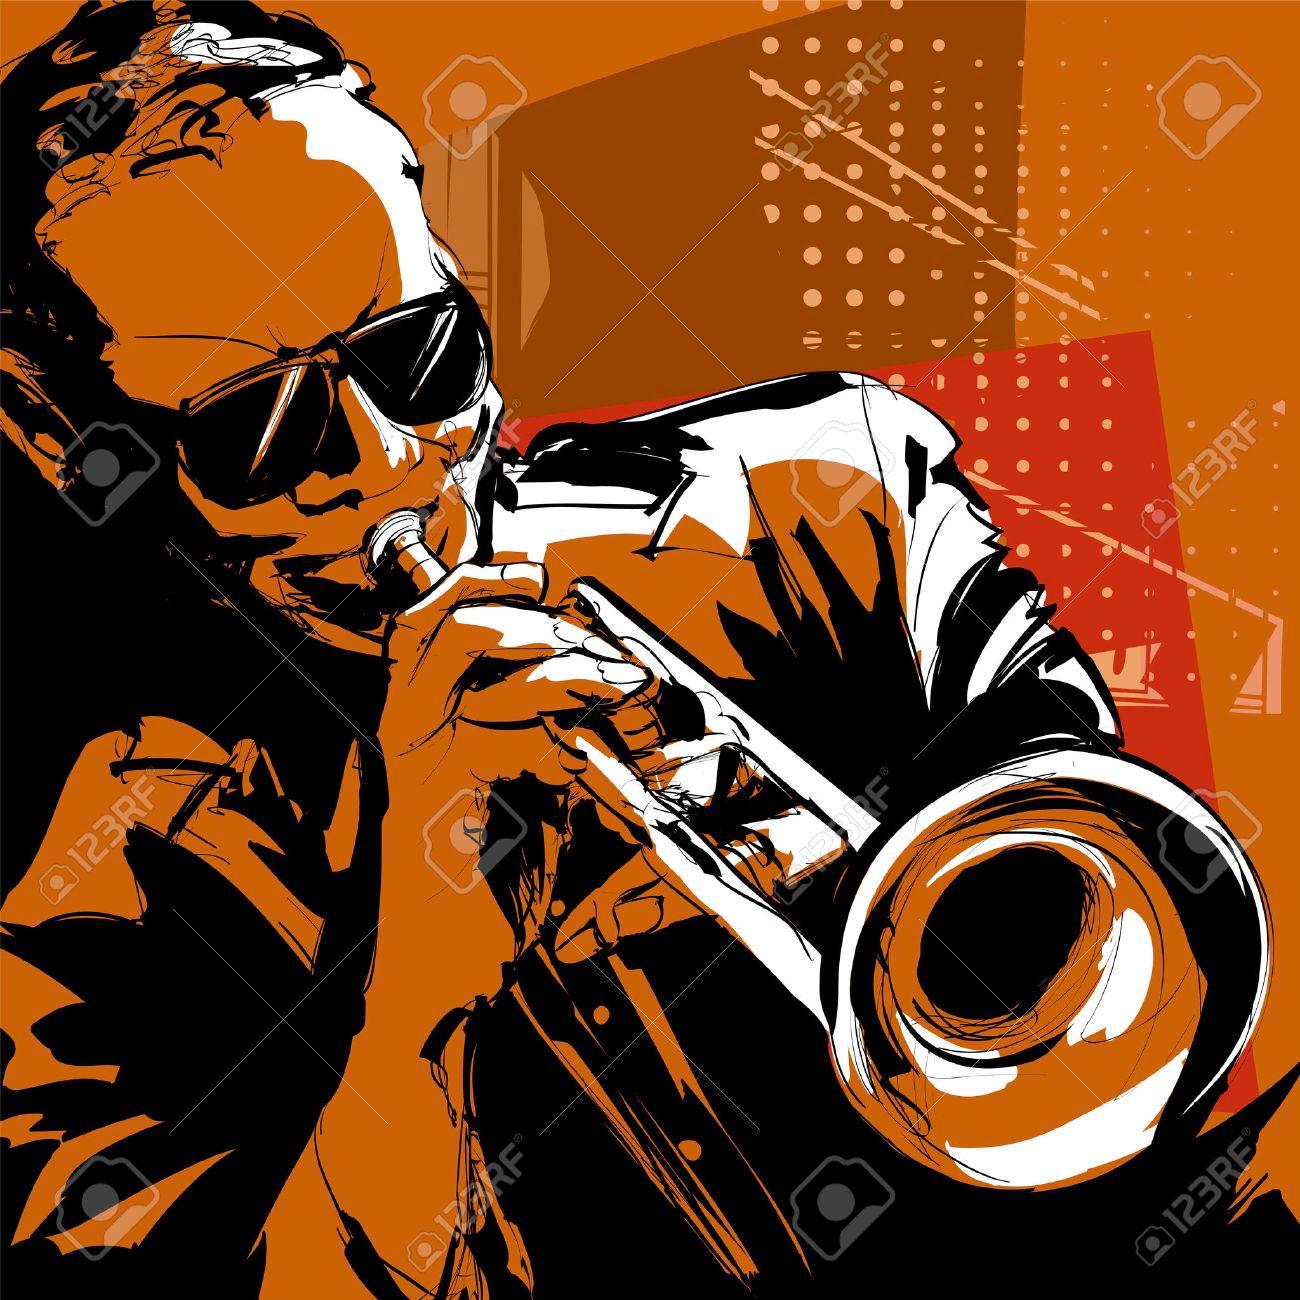 Mile High Jazz Band Cason City evada